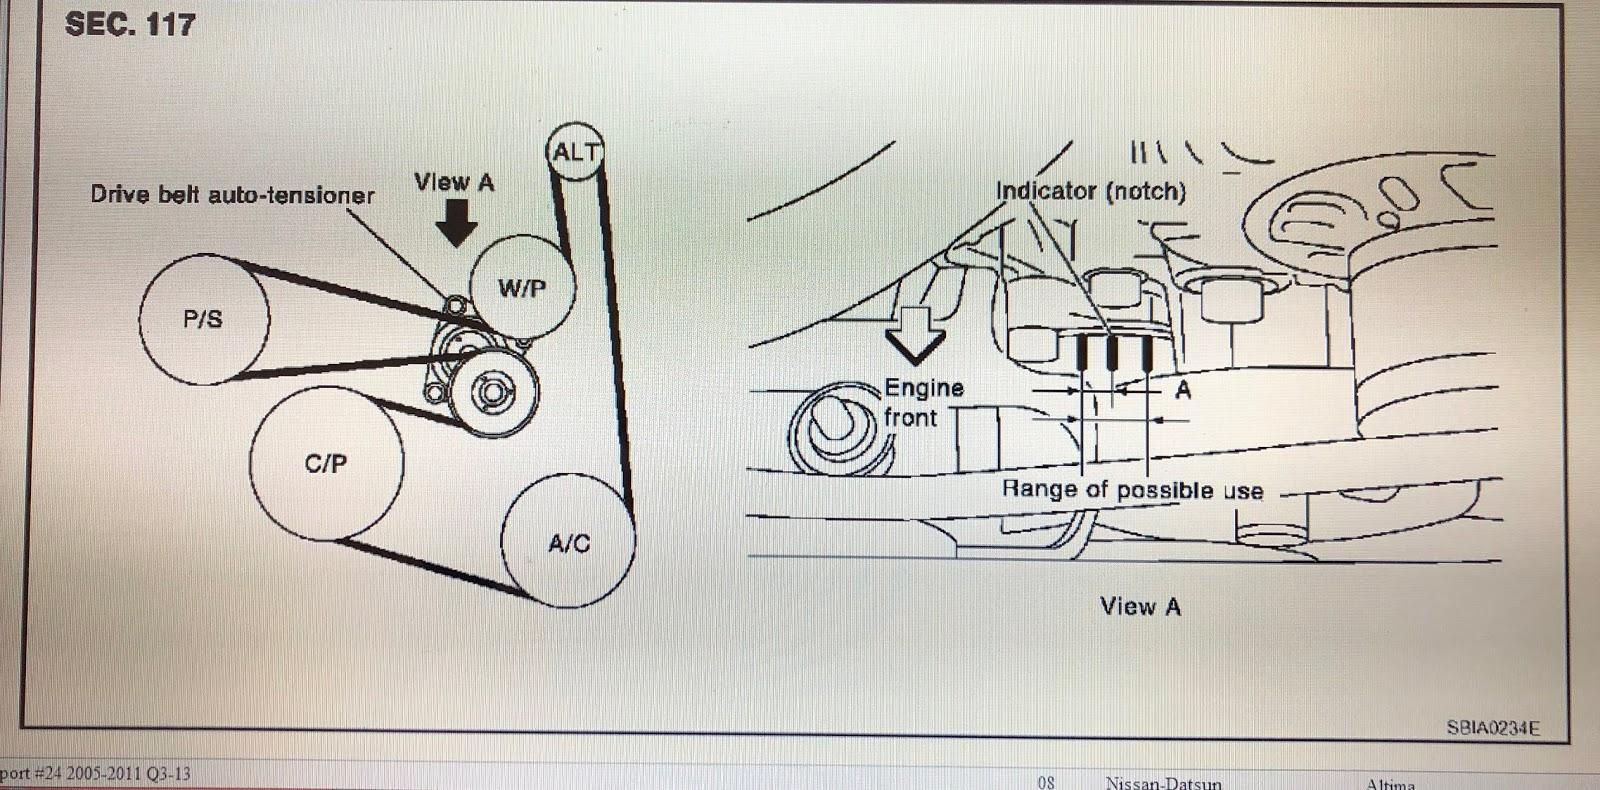 Fix It Angel Diy Auto Maintenance Care 2007 2012 Nissan Altima 2 5l 4 Cylinders Engine Drivebelt Diagram